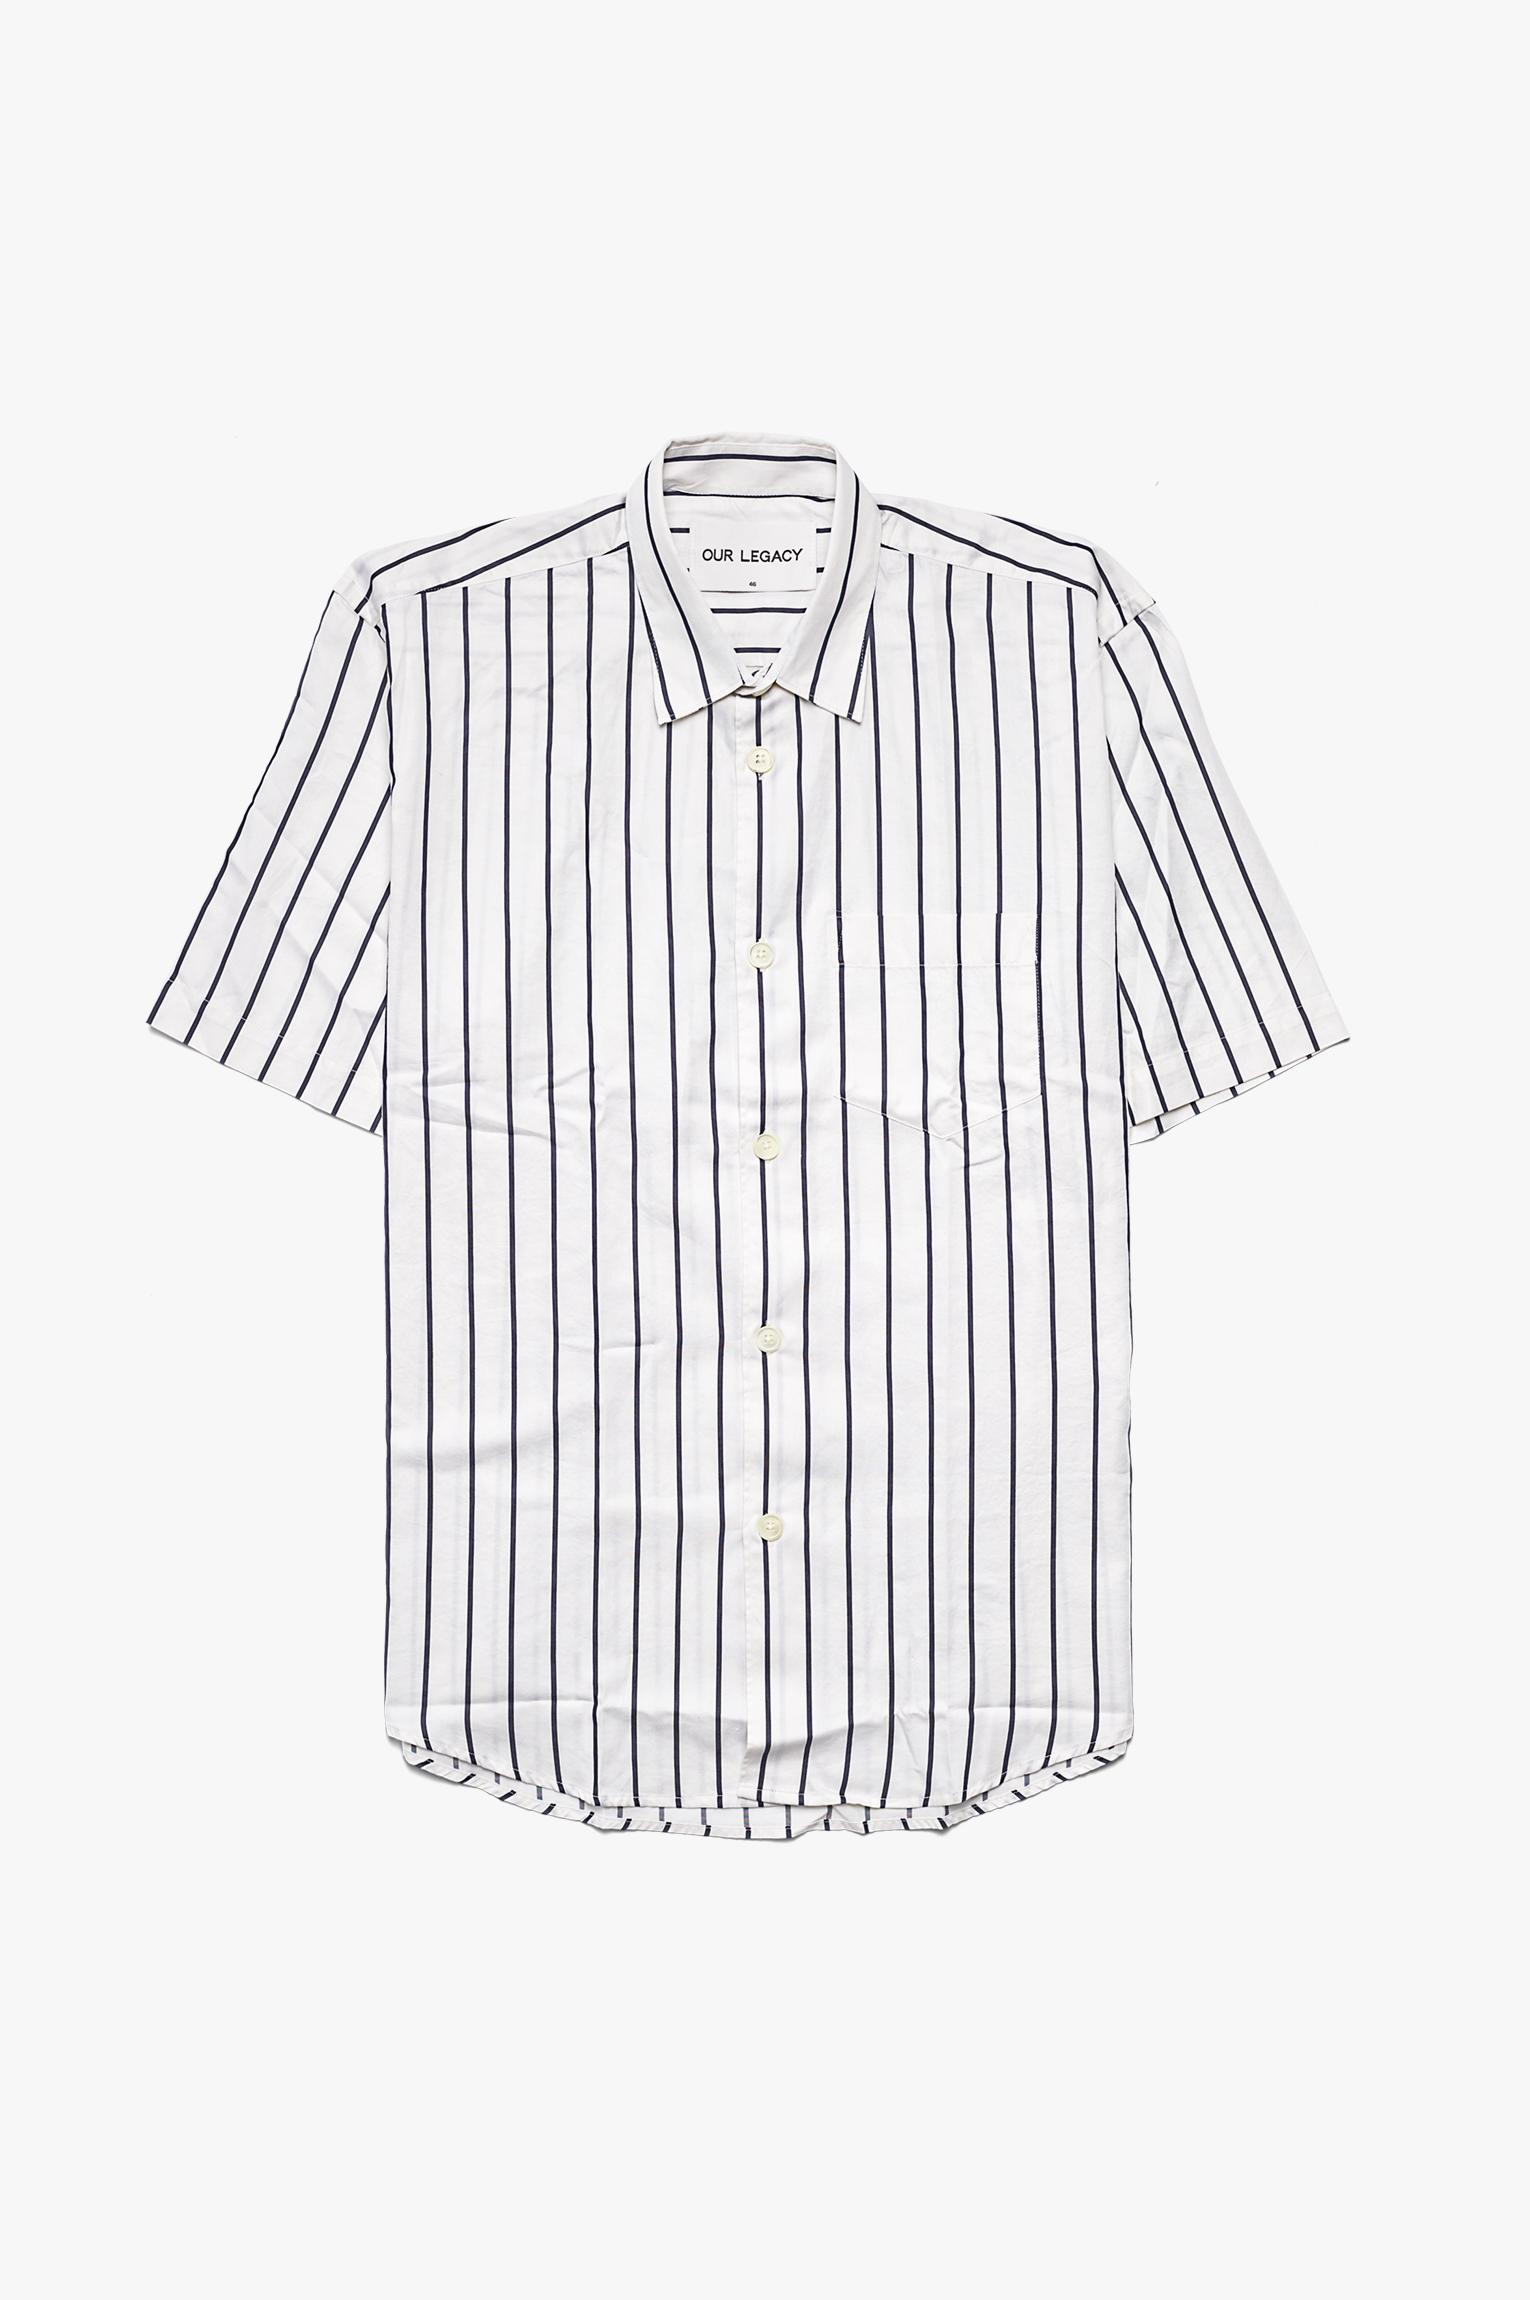 Initial Short Sleeve Shirt Big Blue/White Stripe